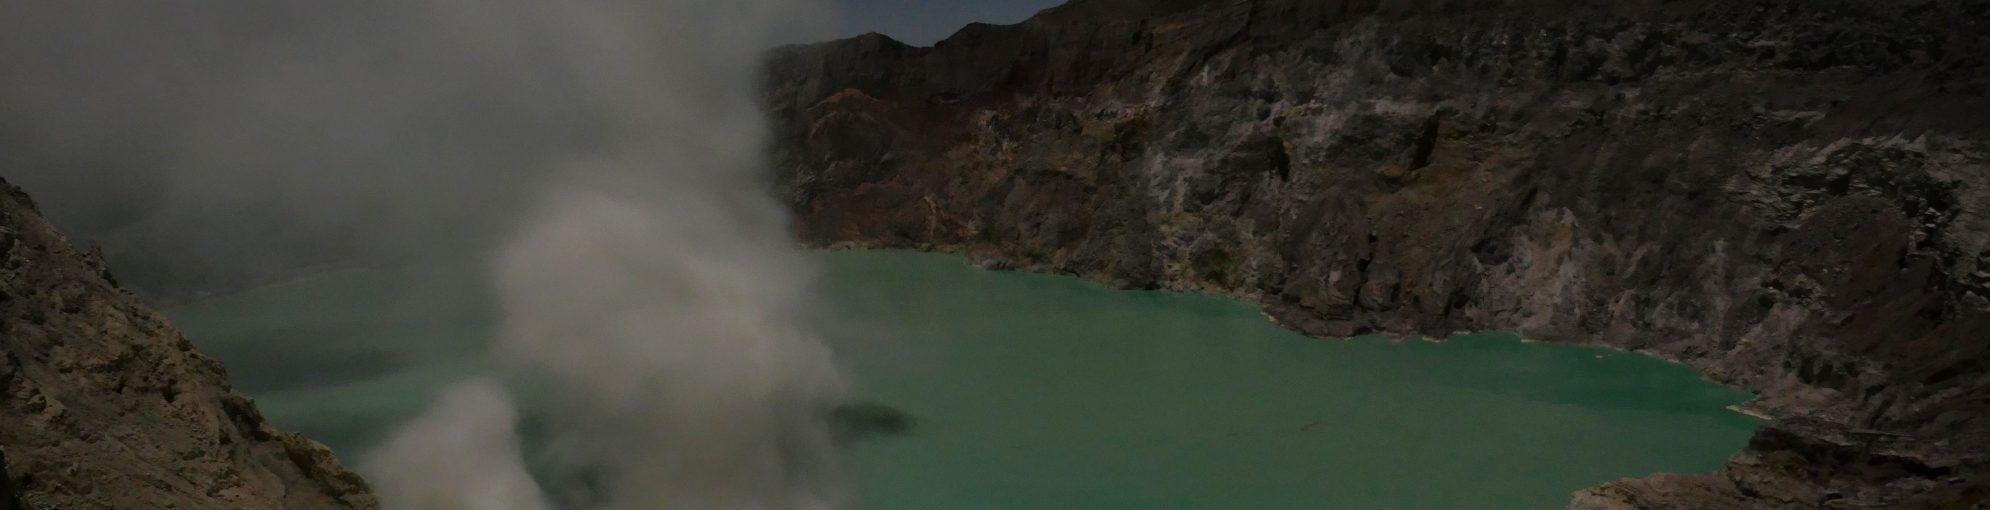 Cities on Volcanoes 4